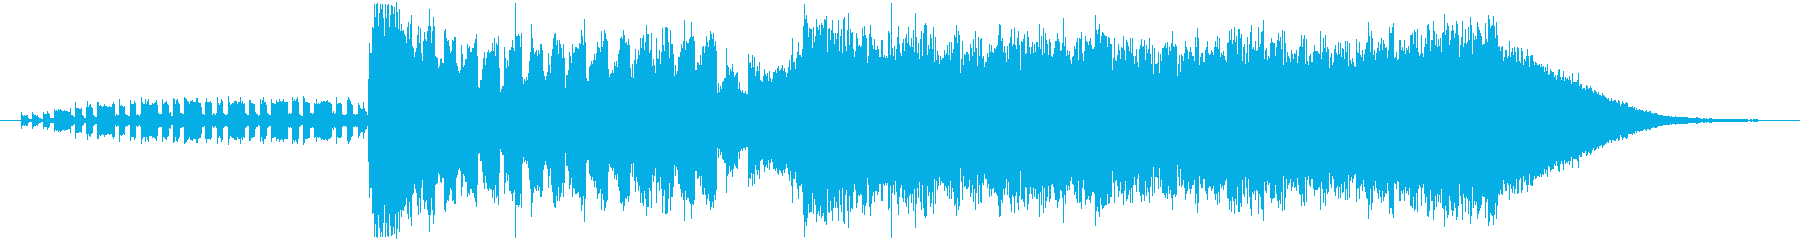 LIVEの入場を想定したEDMの再生済みの波形